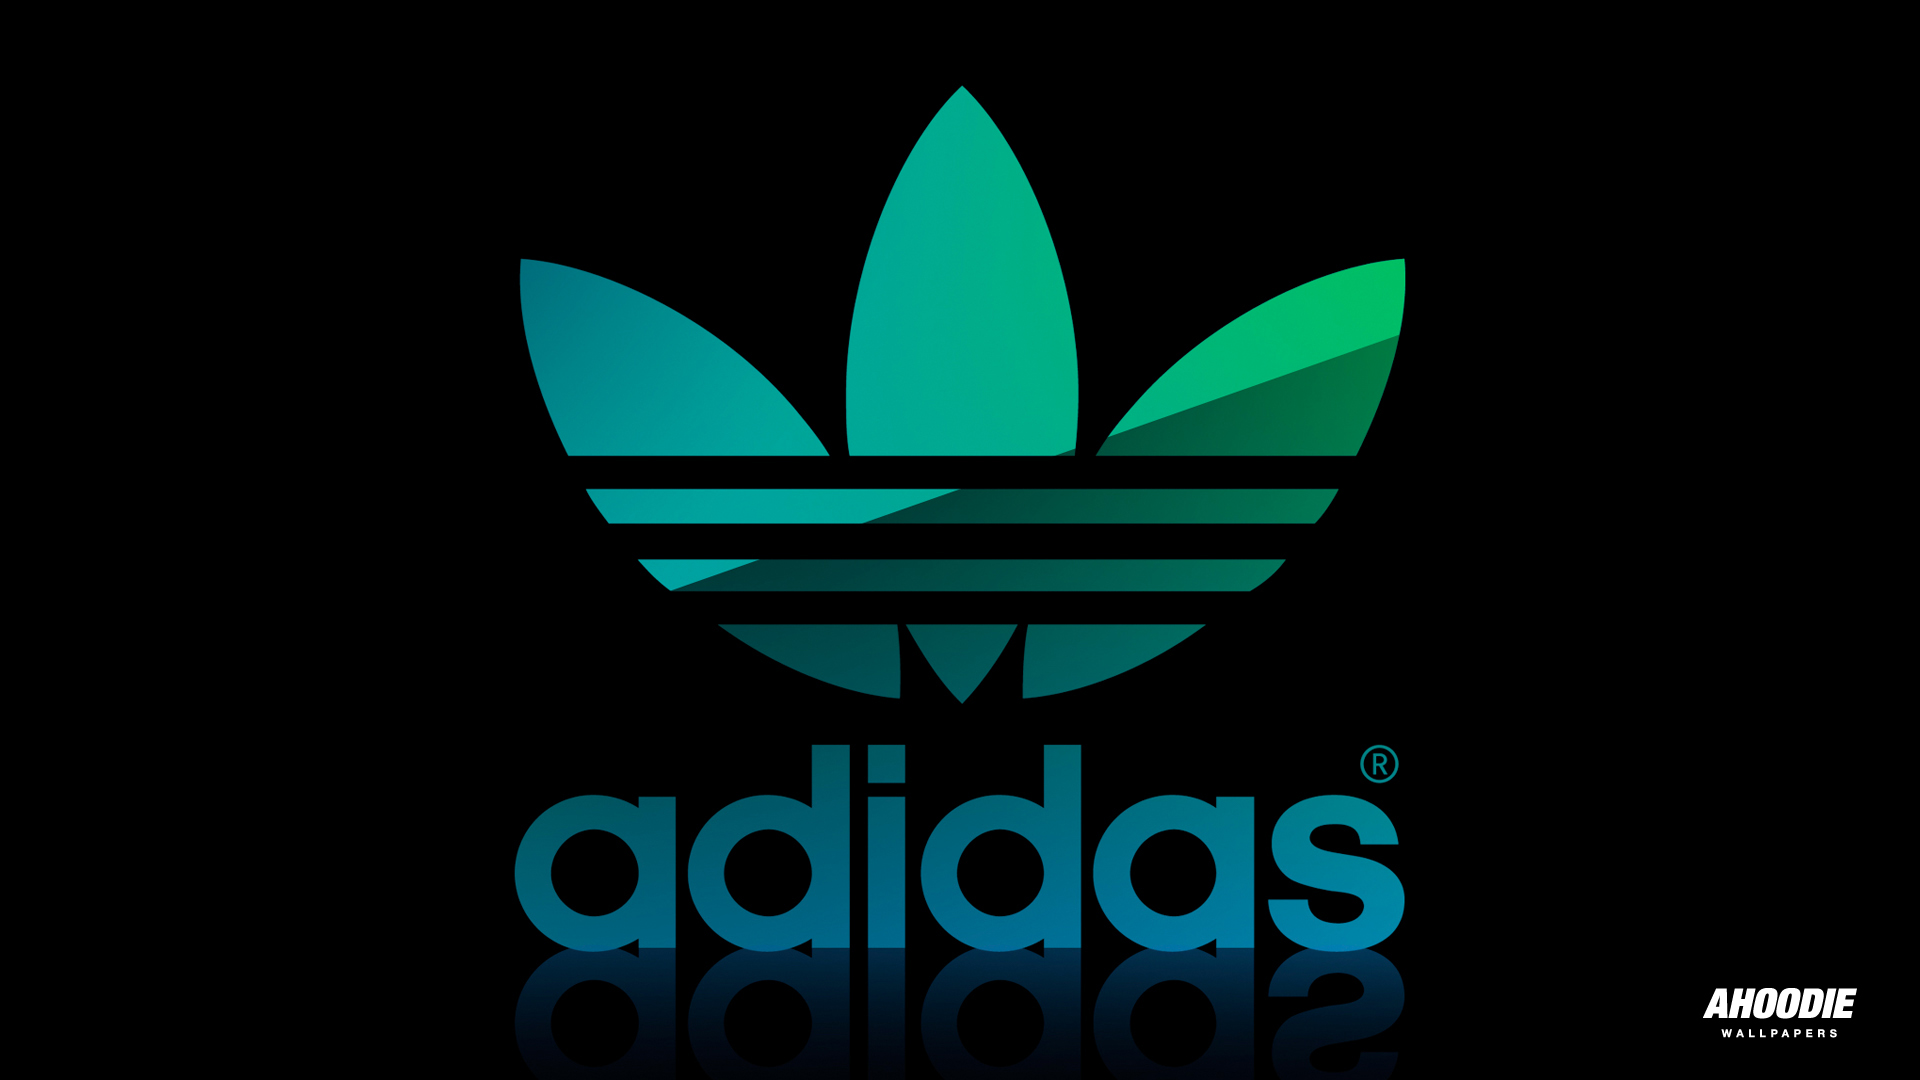 Adidas Chelsea Wallpaper ImageBankbiz 1920x1080